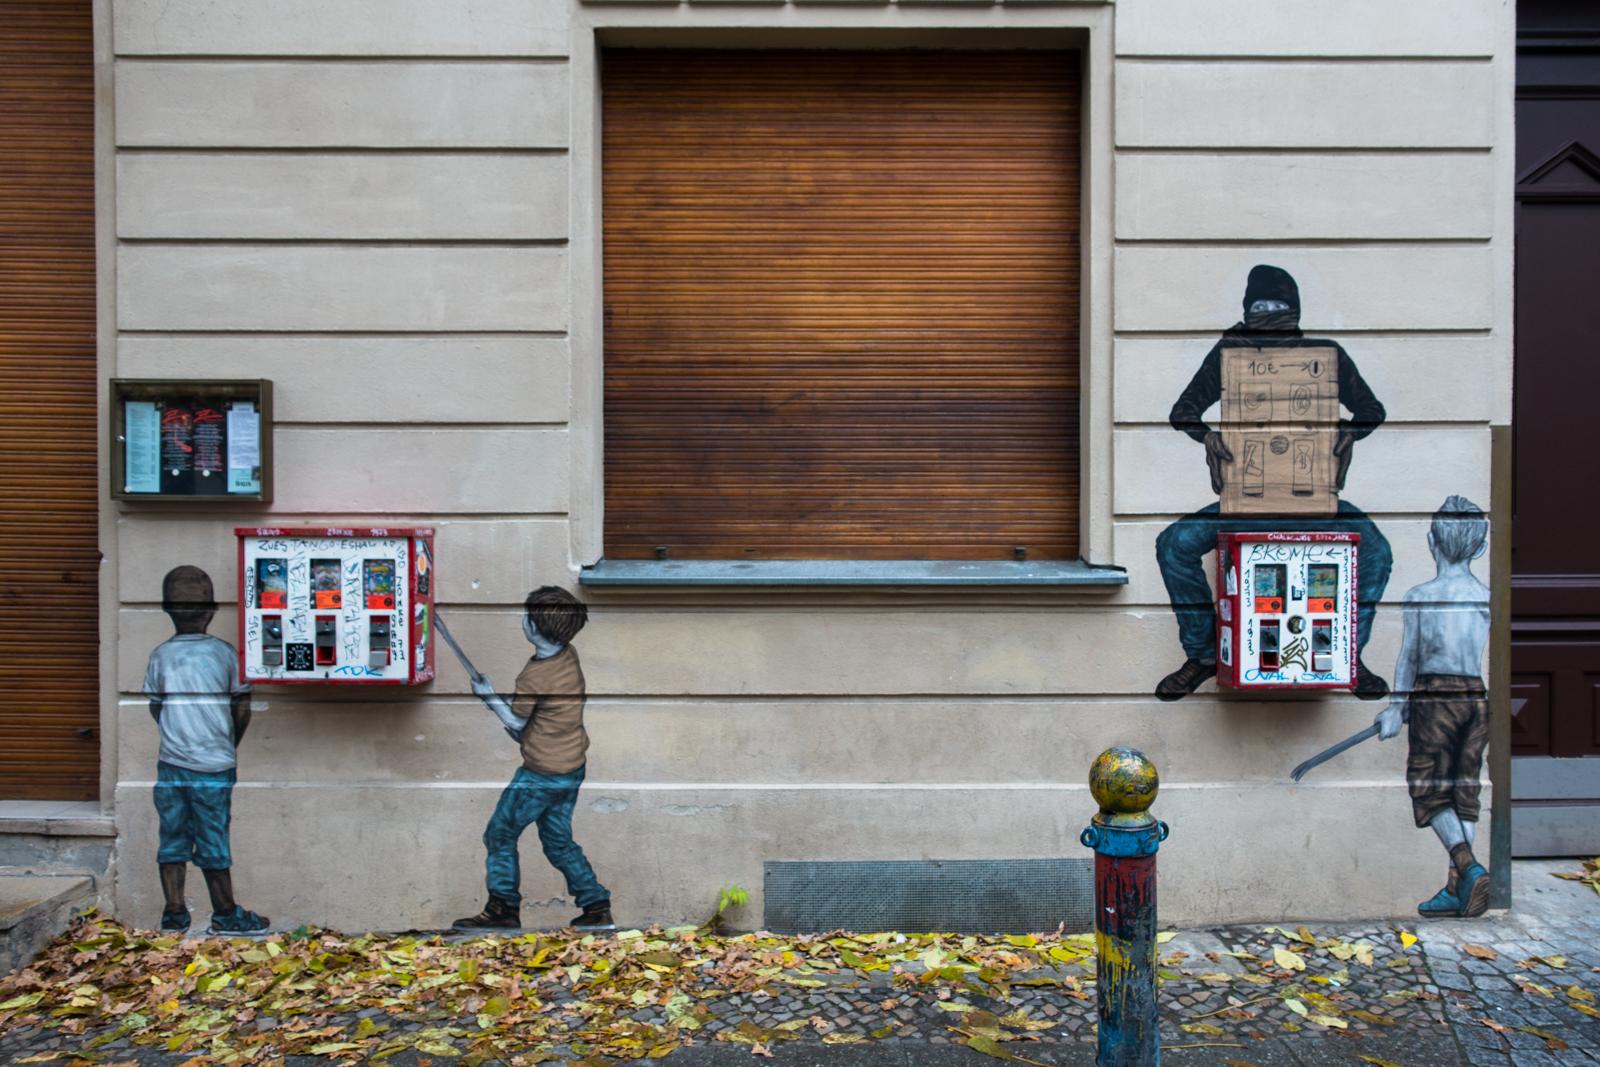 levalets paste ups – bergstrasse, berlin